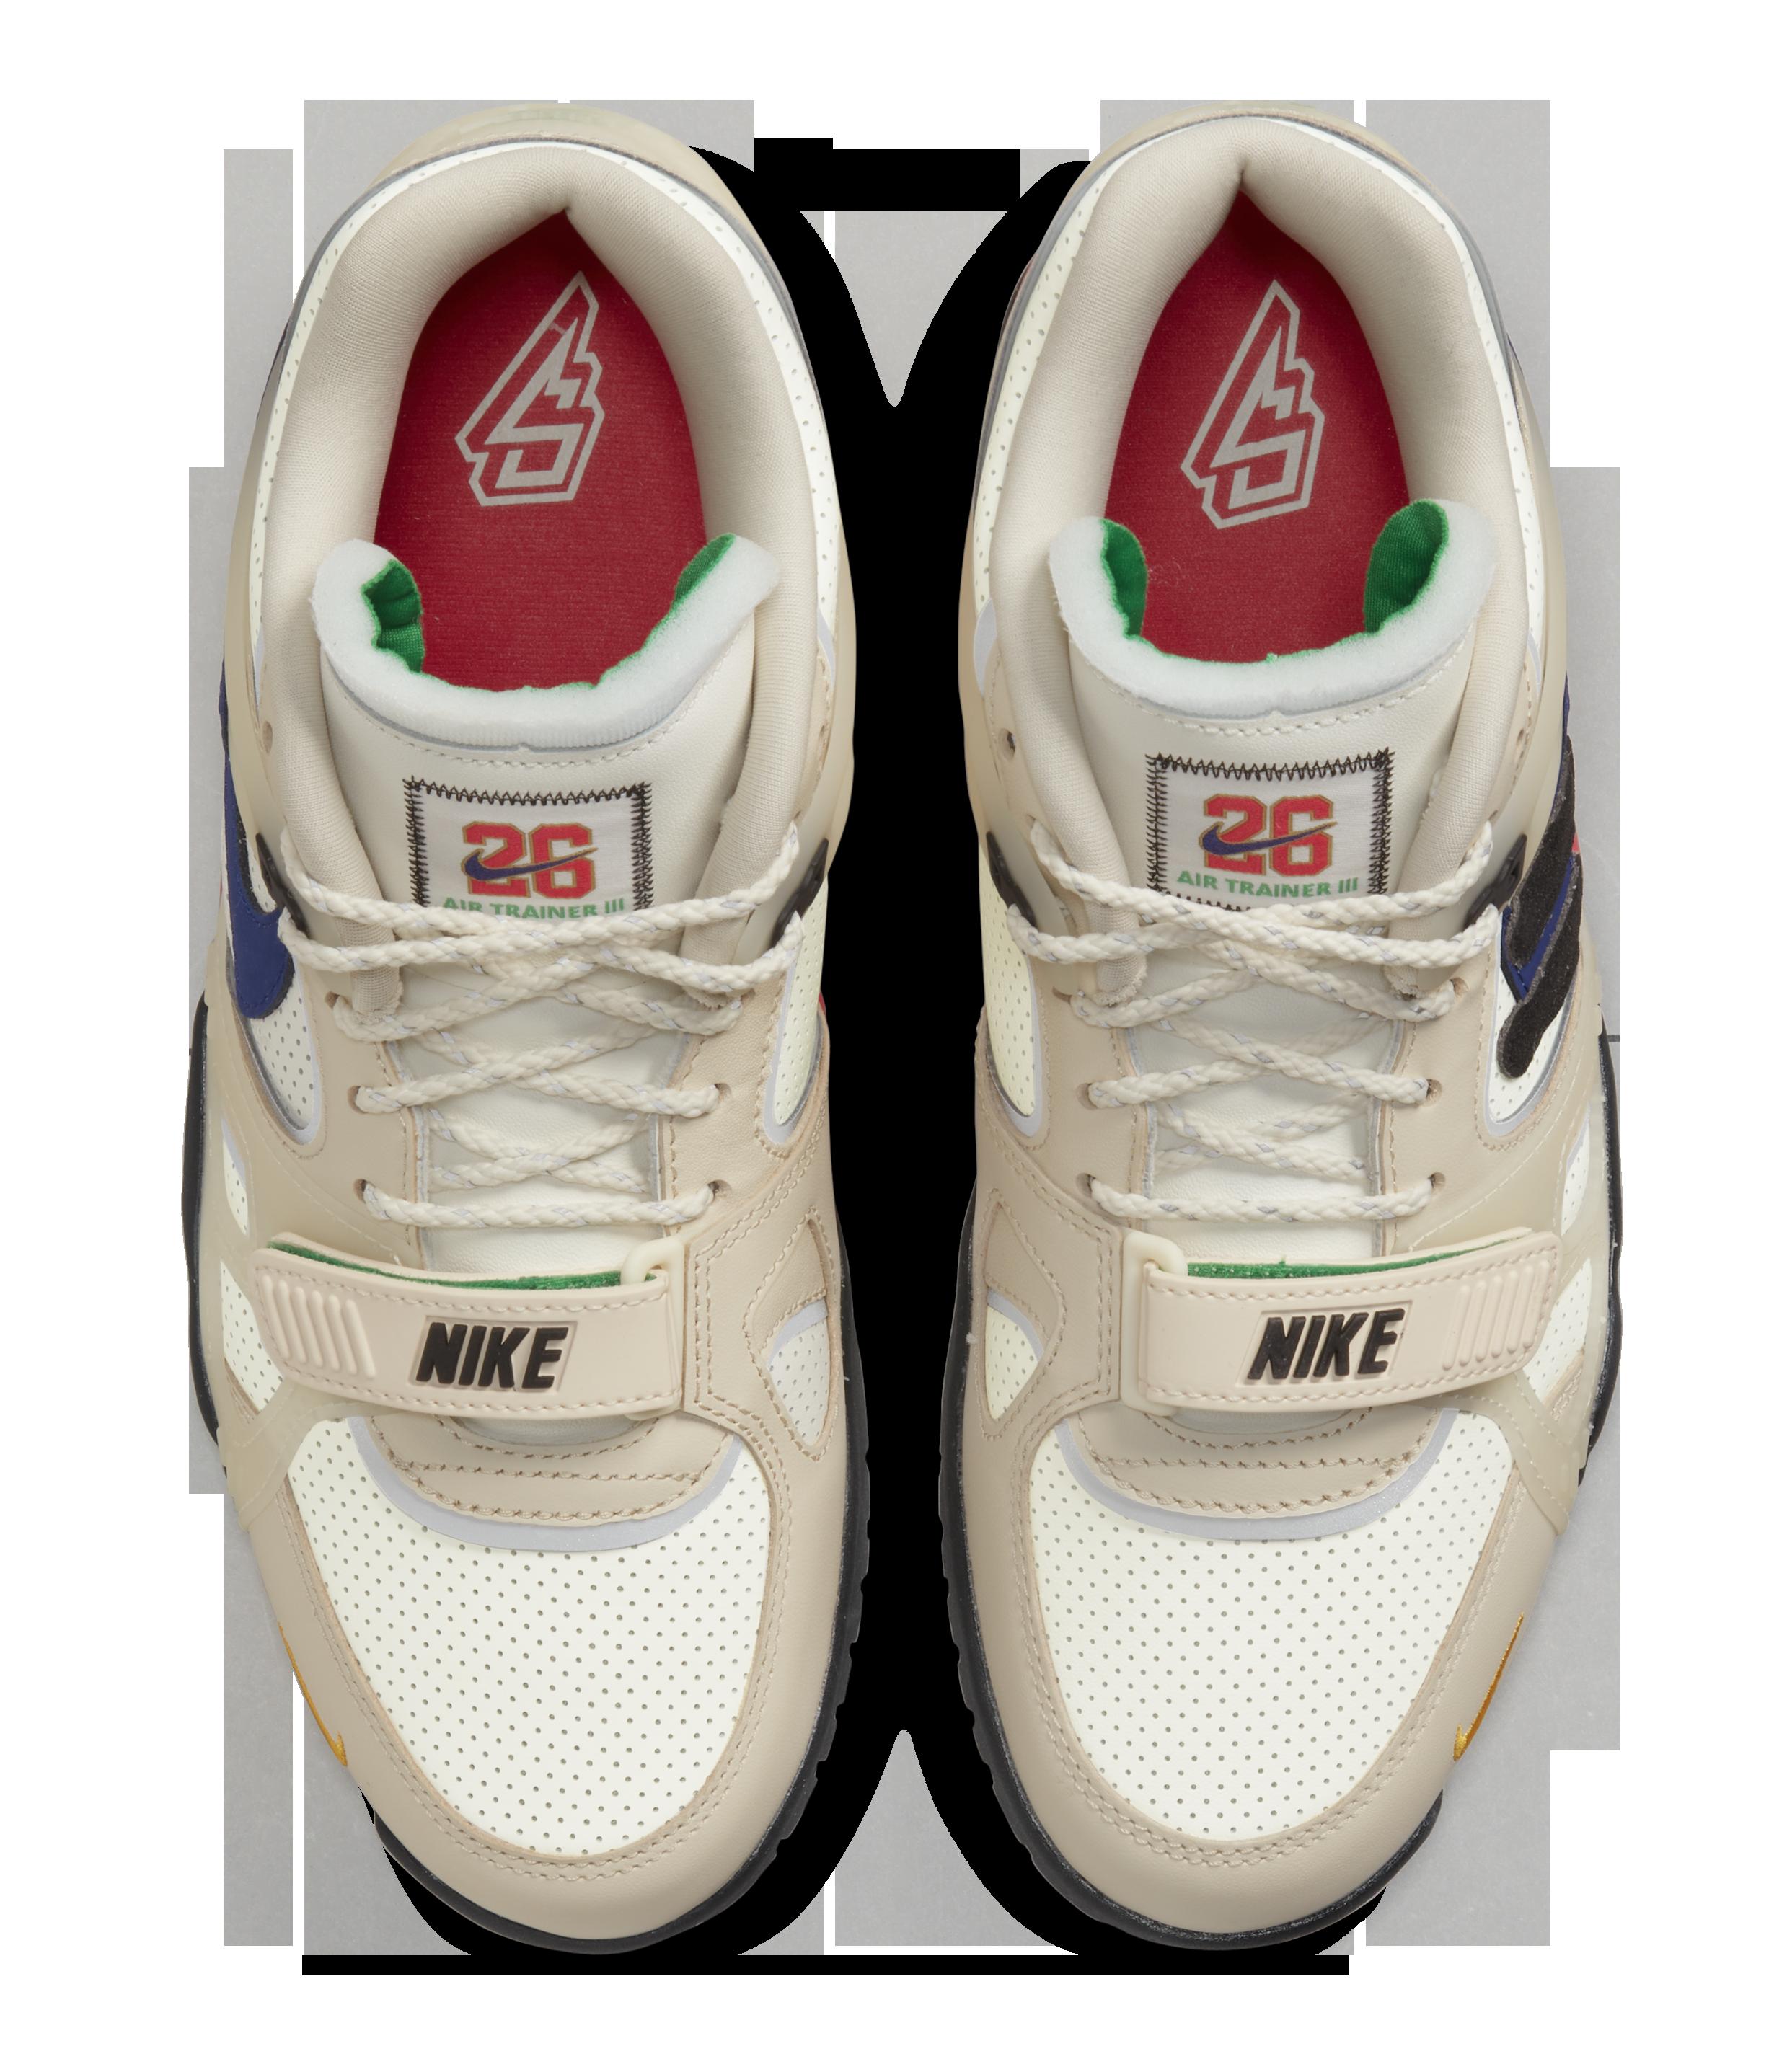 Nike Saquon Air Trainer III DA5403-200 Top